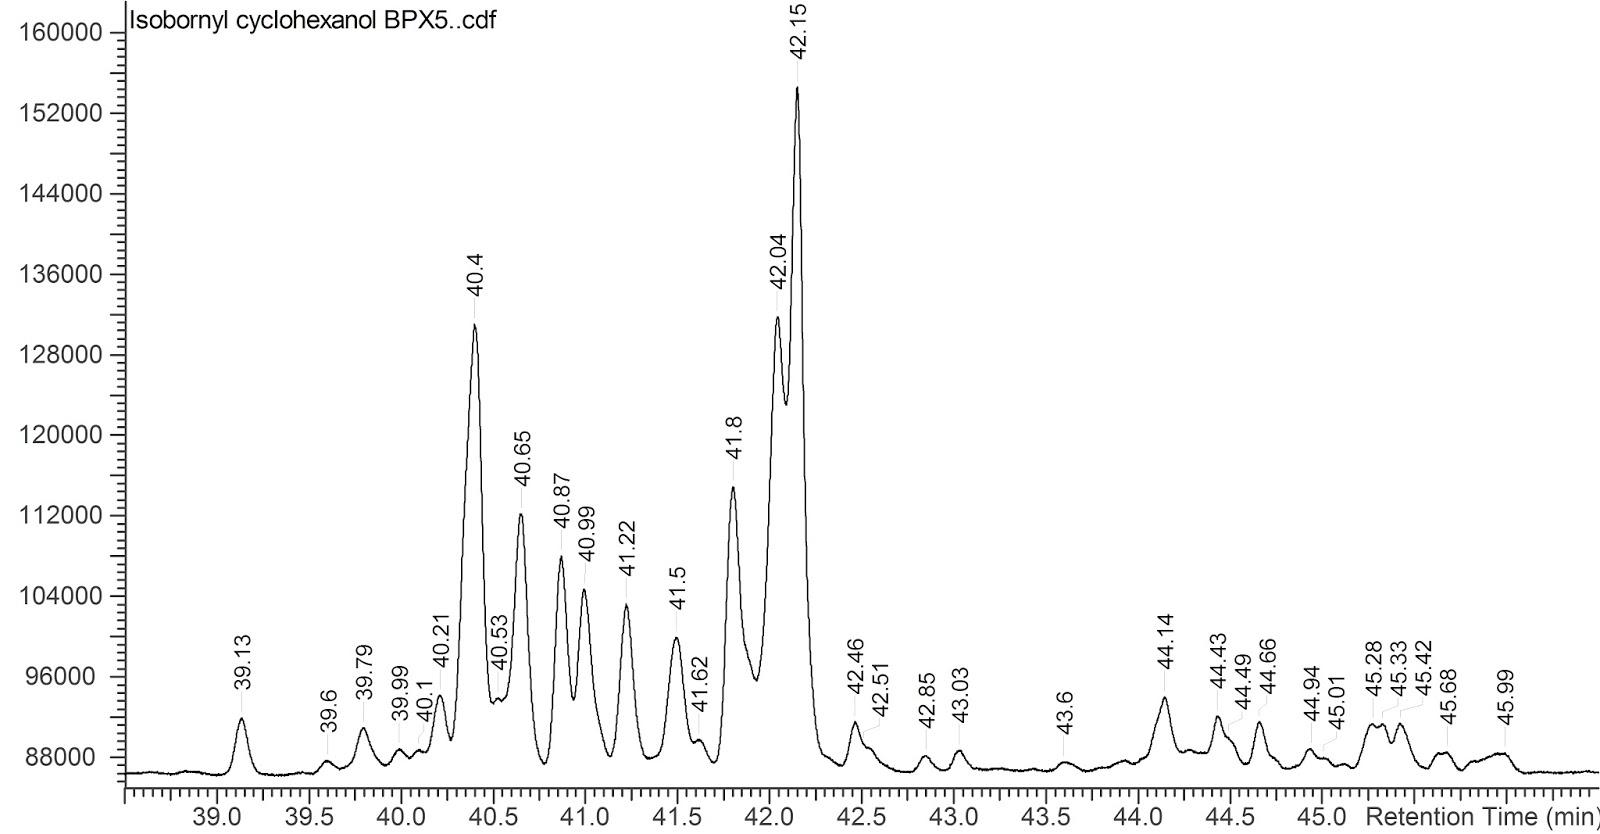 Phytochemia S Blog Isobornyl Cyclohexanol And You